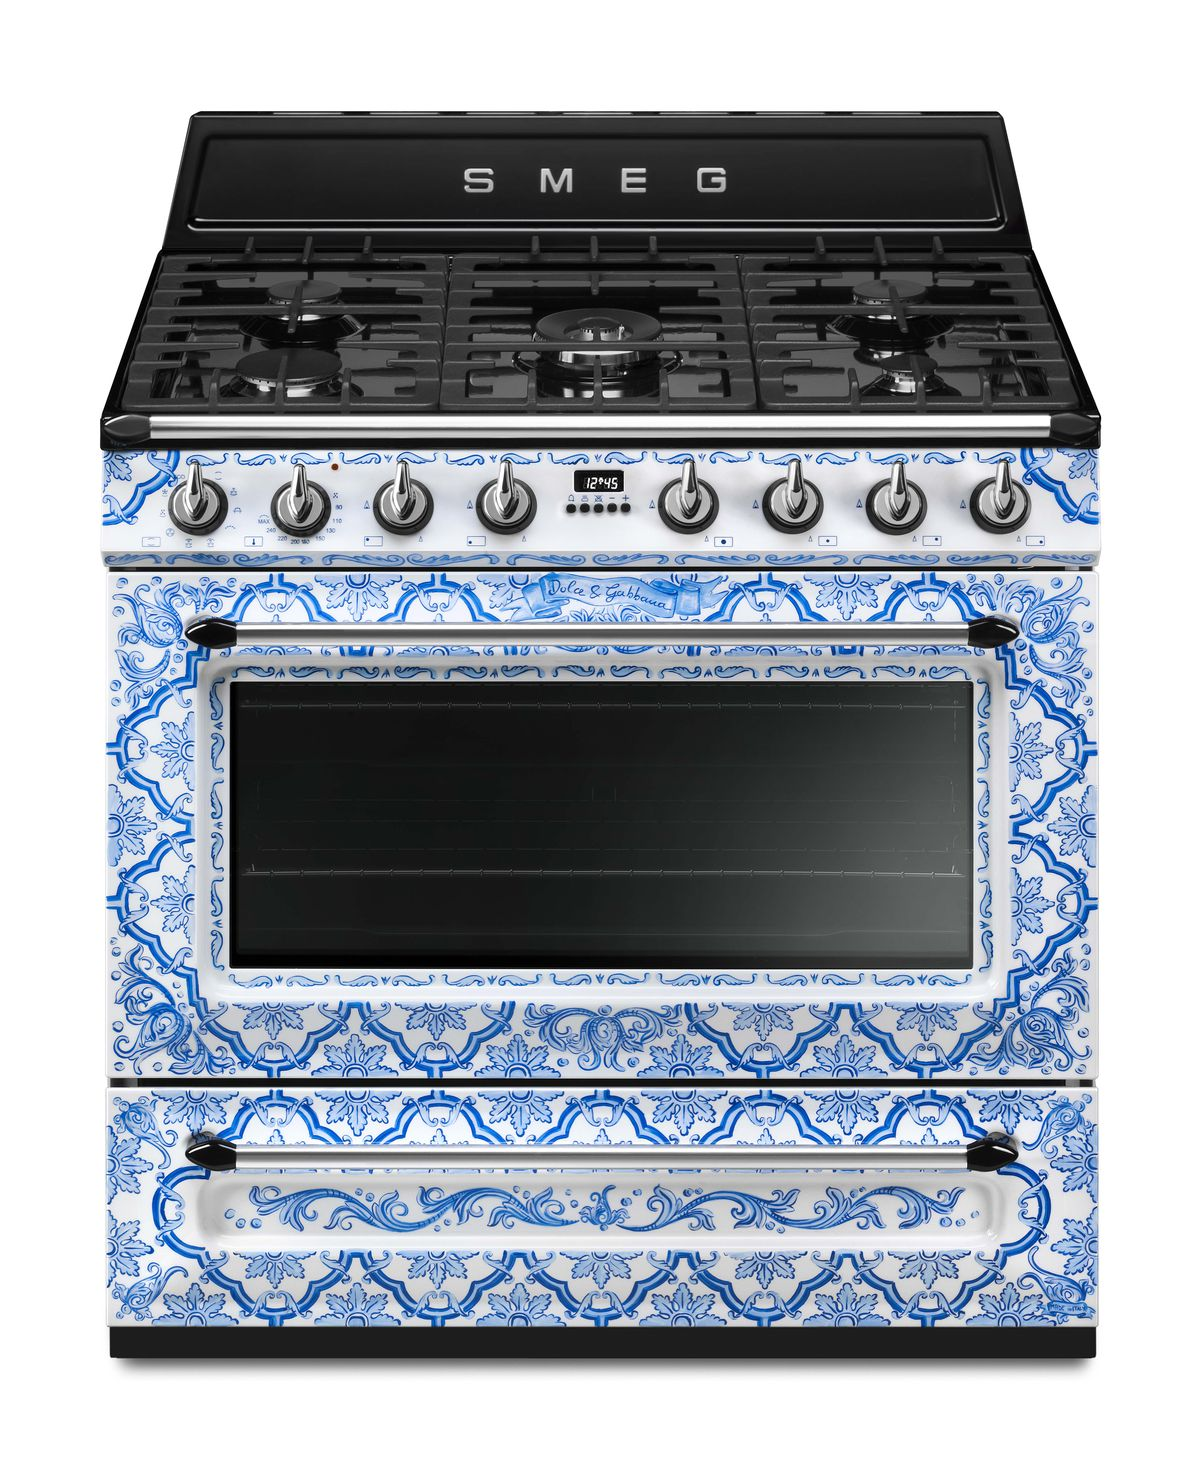 Dolce Gabbana For Smeg Kitchen Appliances Expands Again Curbed